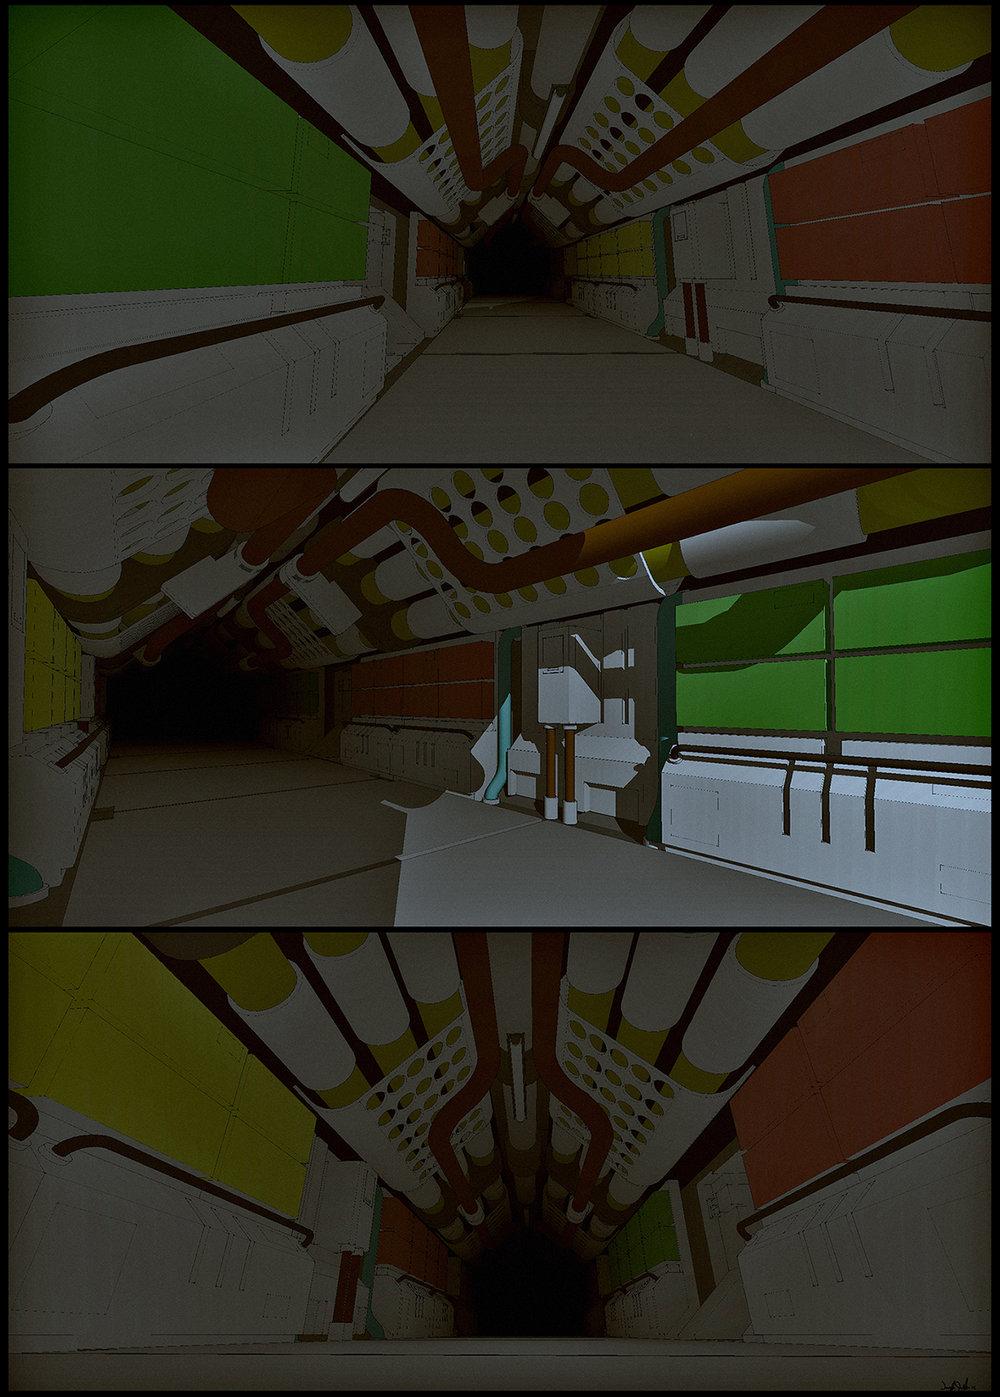 Gotg_Corridor_02.jpg